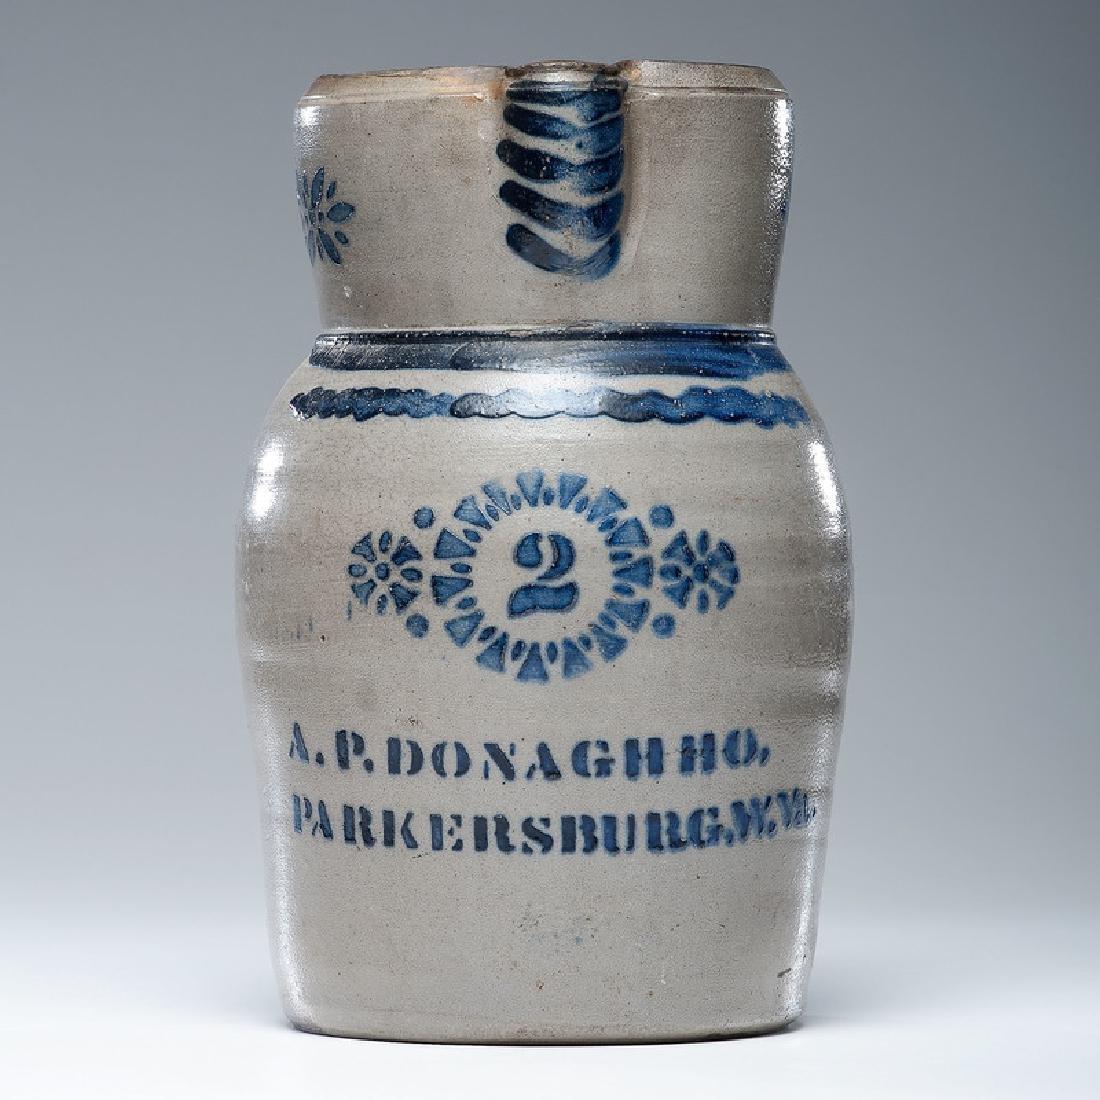 A.P. Donaghho Two Gallon Stoneware Pitcher